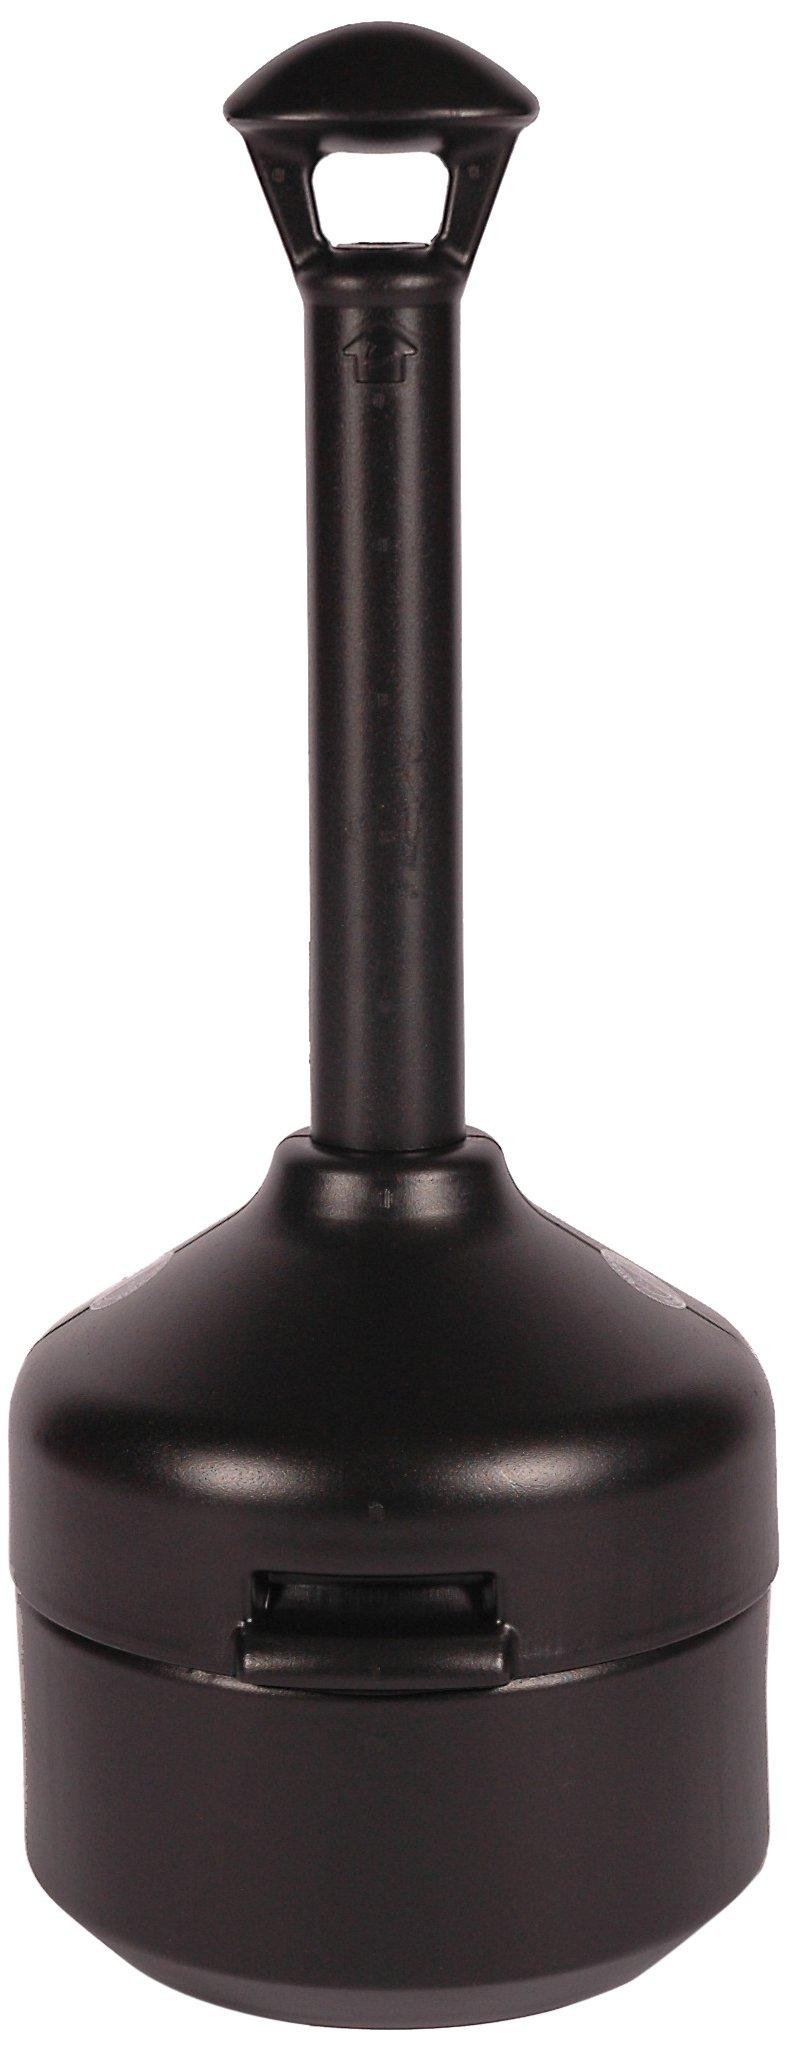 UltraTech 1546 Polyethylene Classic Cigarette Ultra-Smoke Stop Receptacle, 14'' Diameter x 41'' Height, Black by UltraTech